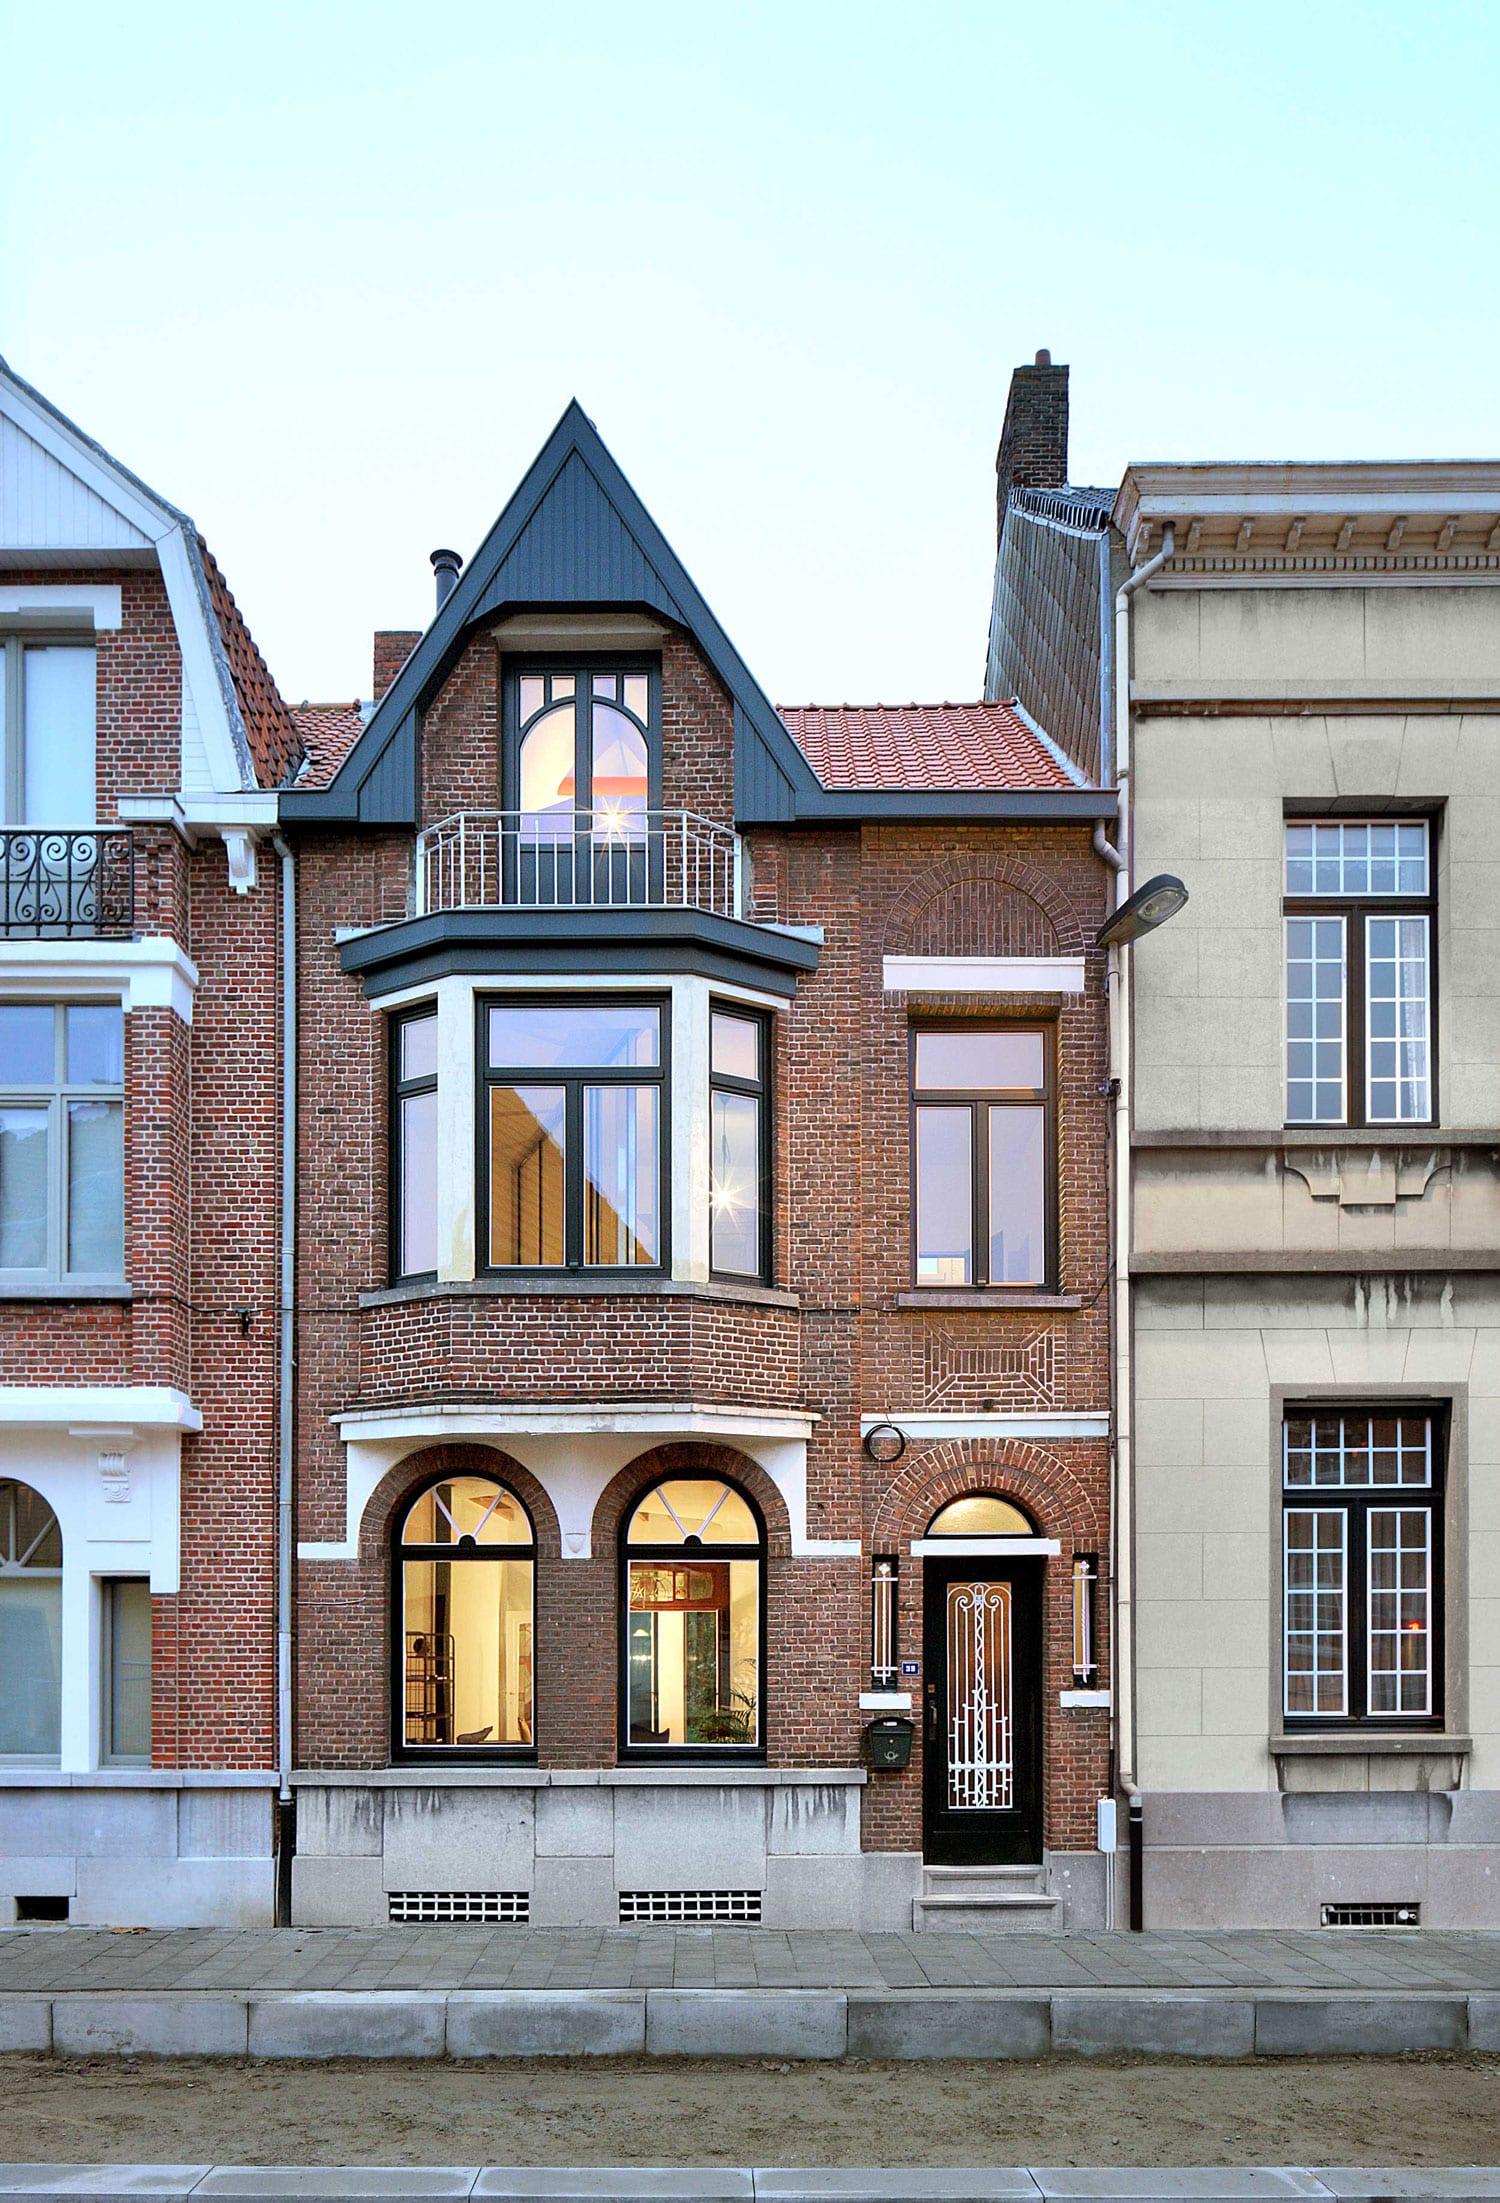 Vos House in Ekeren, Belgium by Architecten de Vylder Vinck Taillieu | Yellowtrace